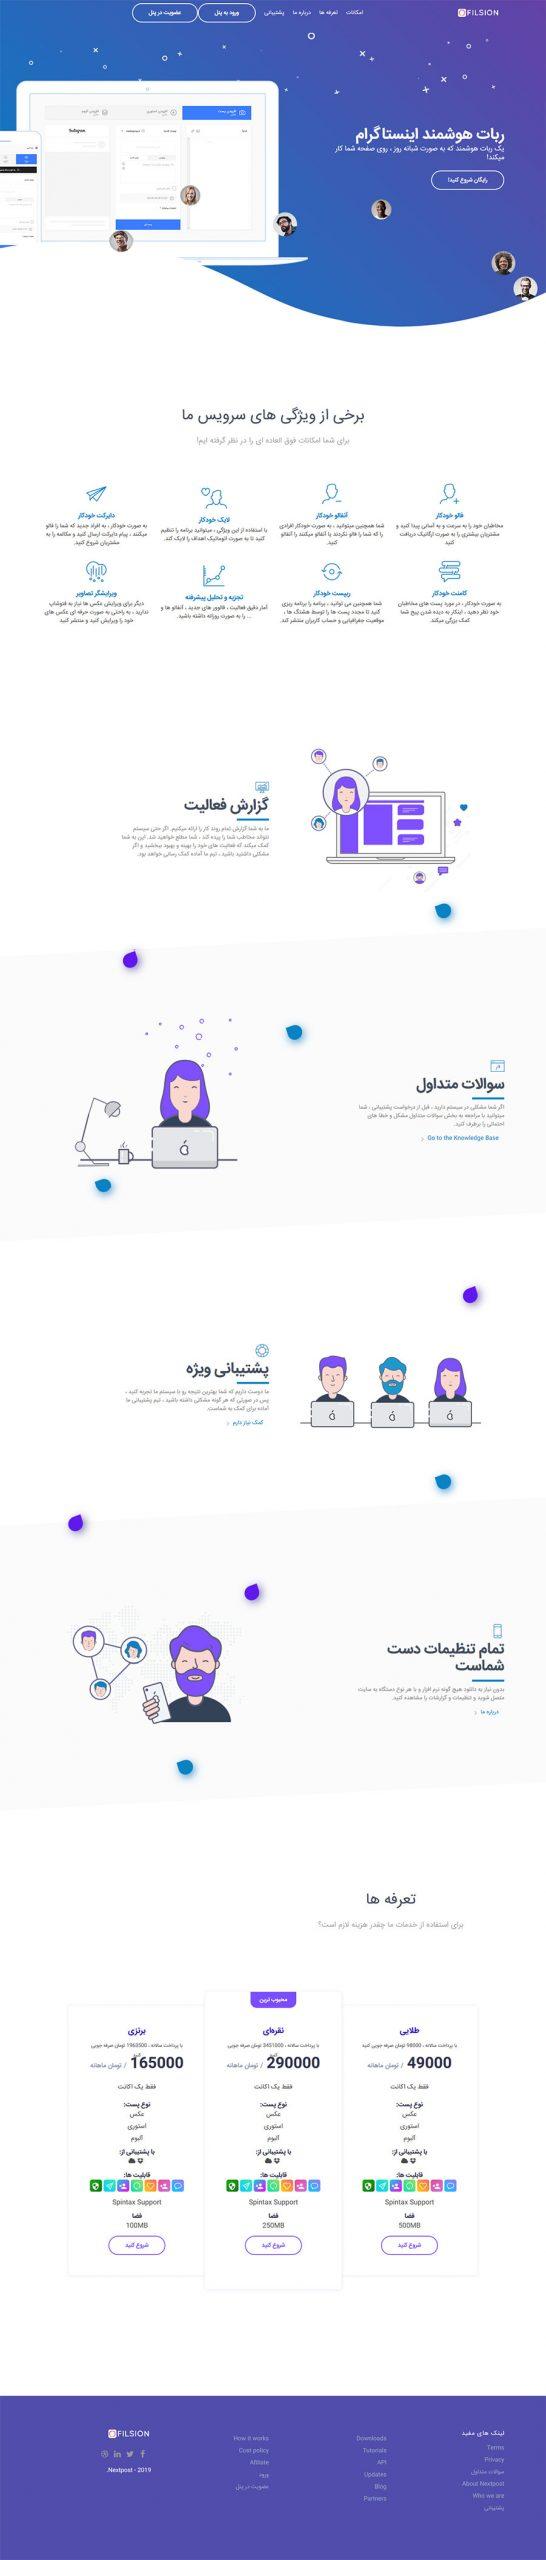 Filsionnextpost scaled - قالب Filsion فارسی برای اسکریپت NextPost